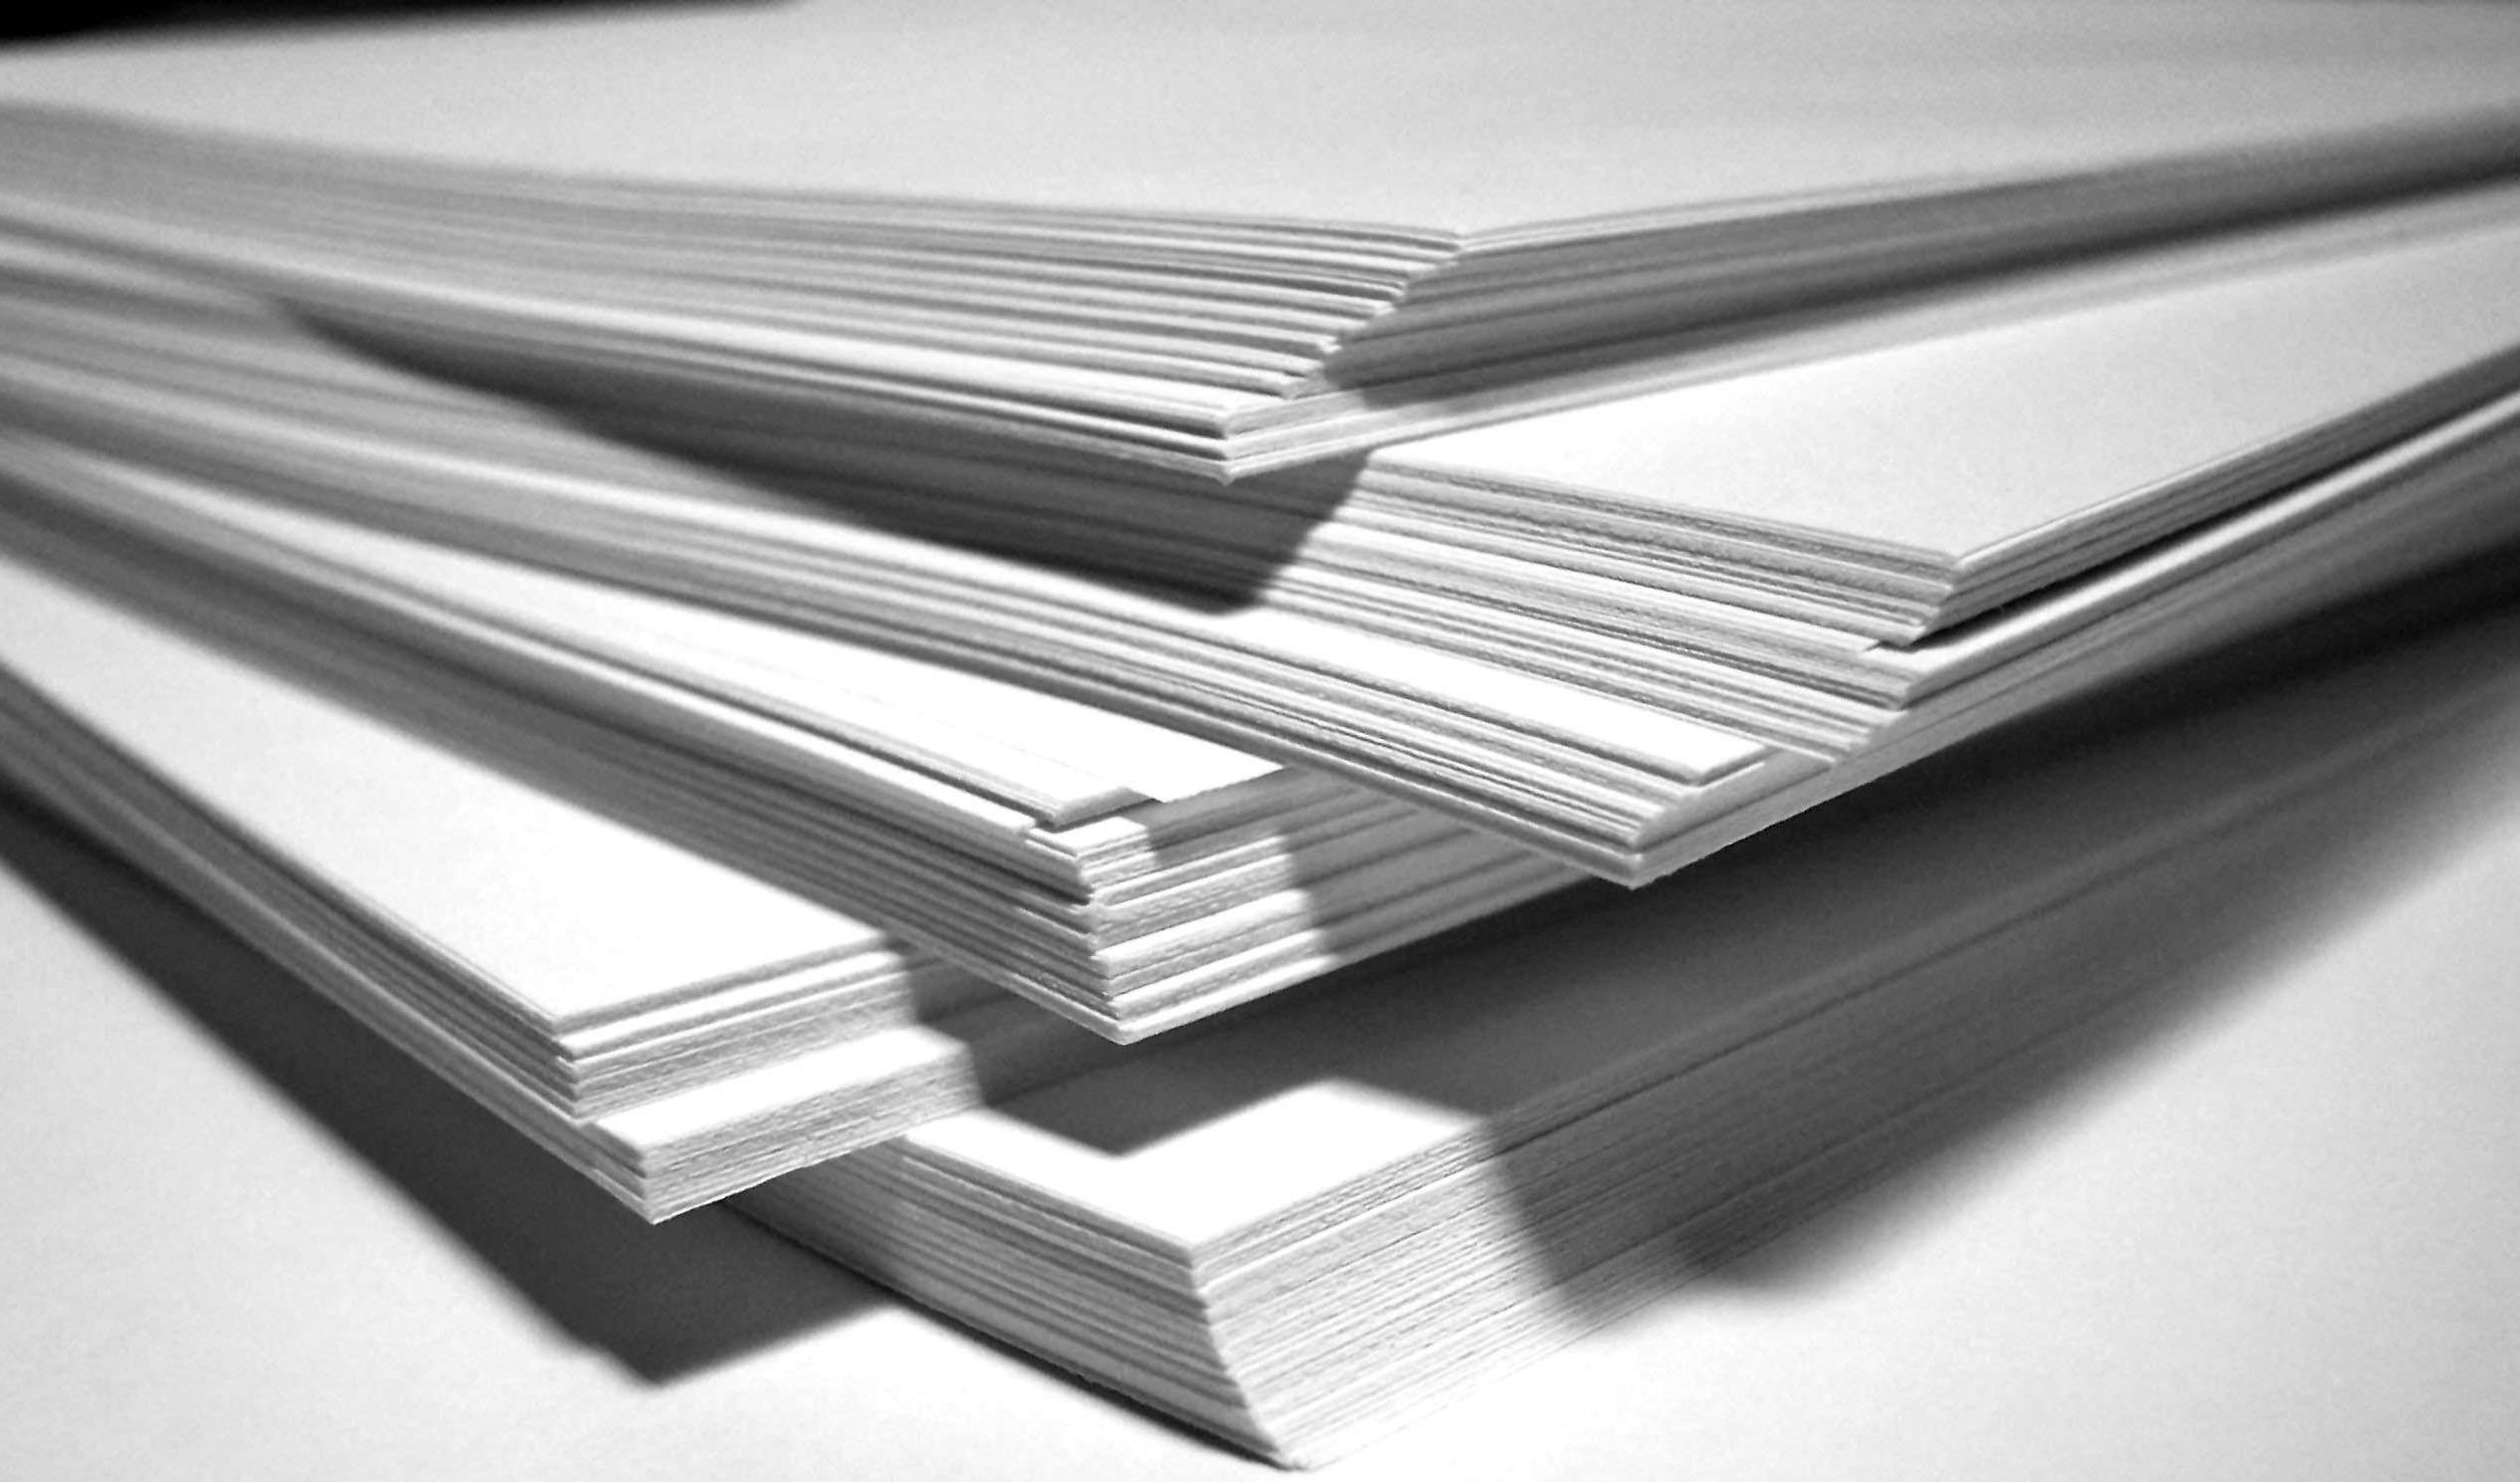 کشف احتکار و محموله کاغذ قاچاق در شهر ری